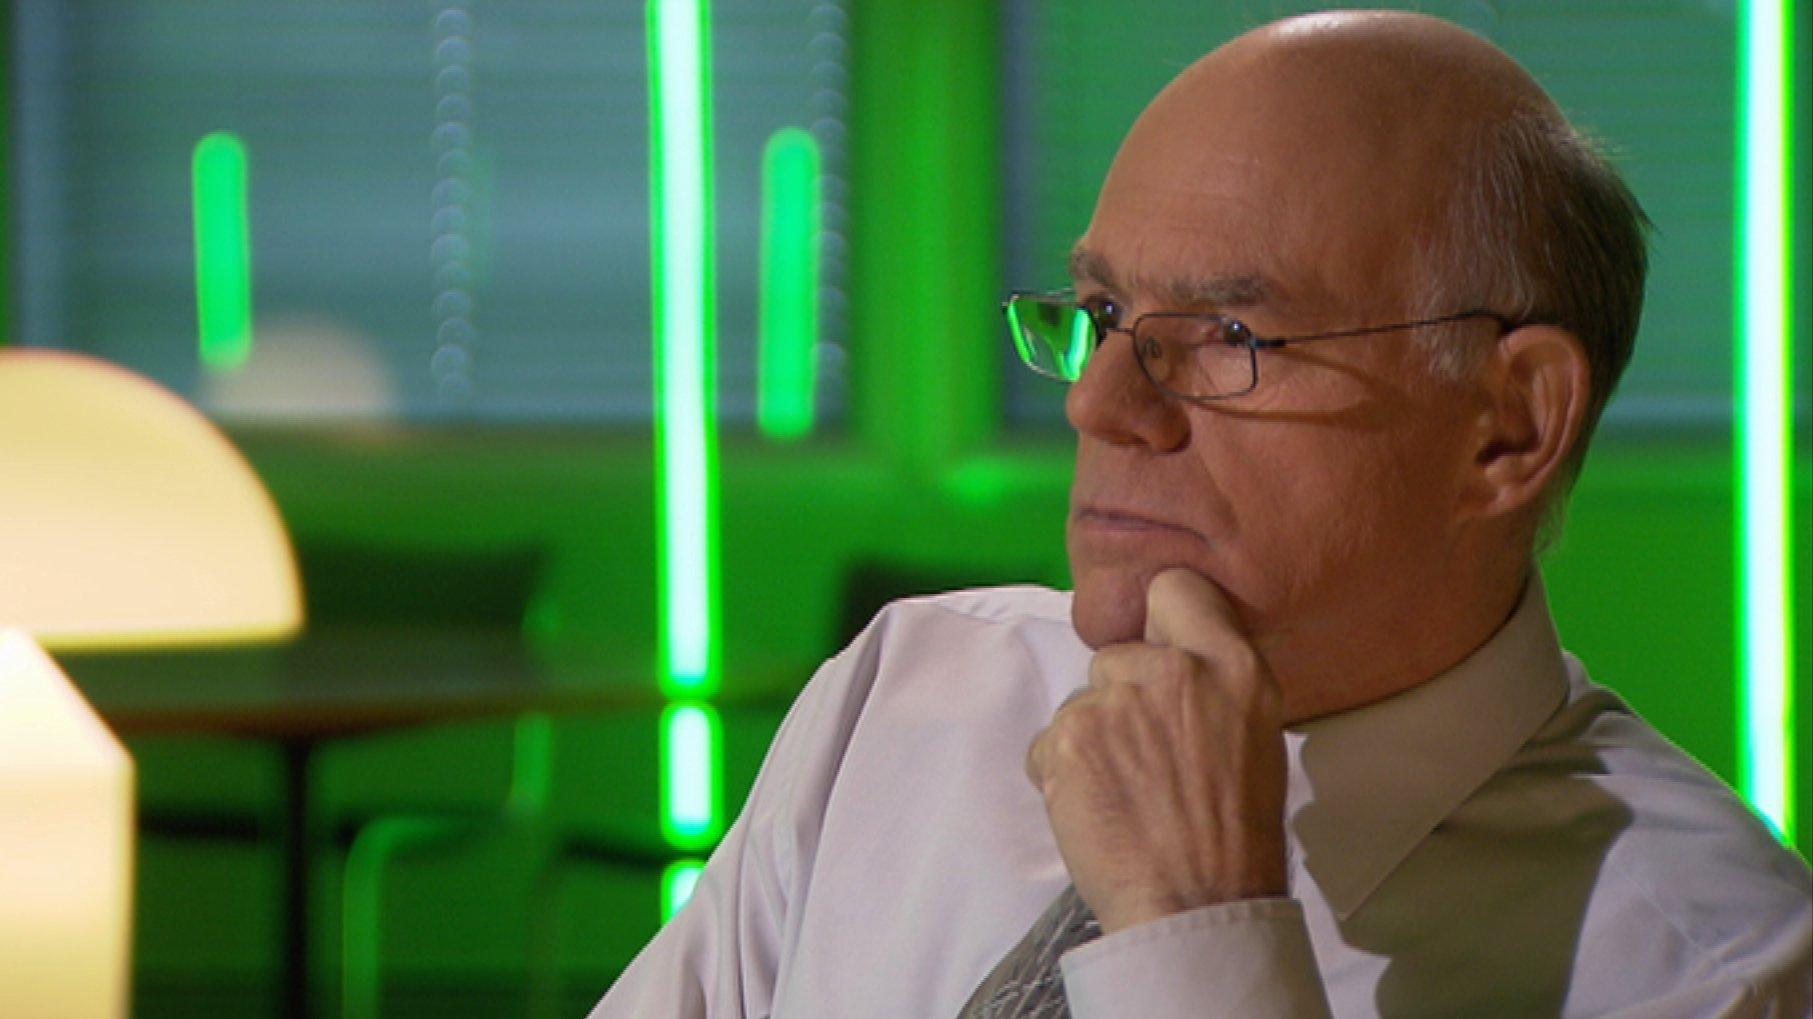 Letzte Rede im Bundestag: So tickt Norbert Lammert